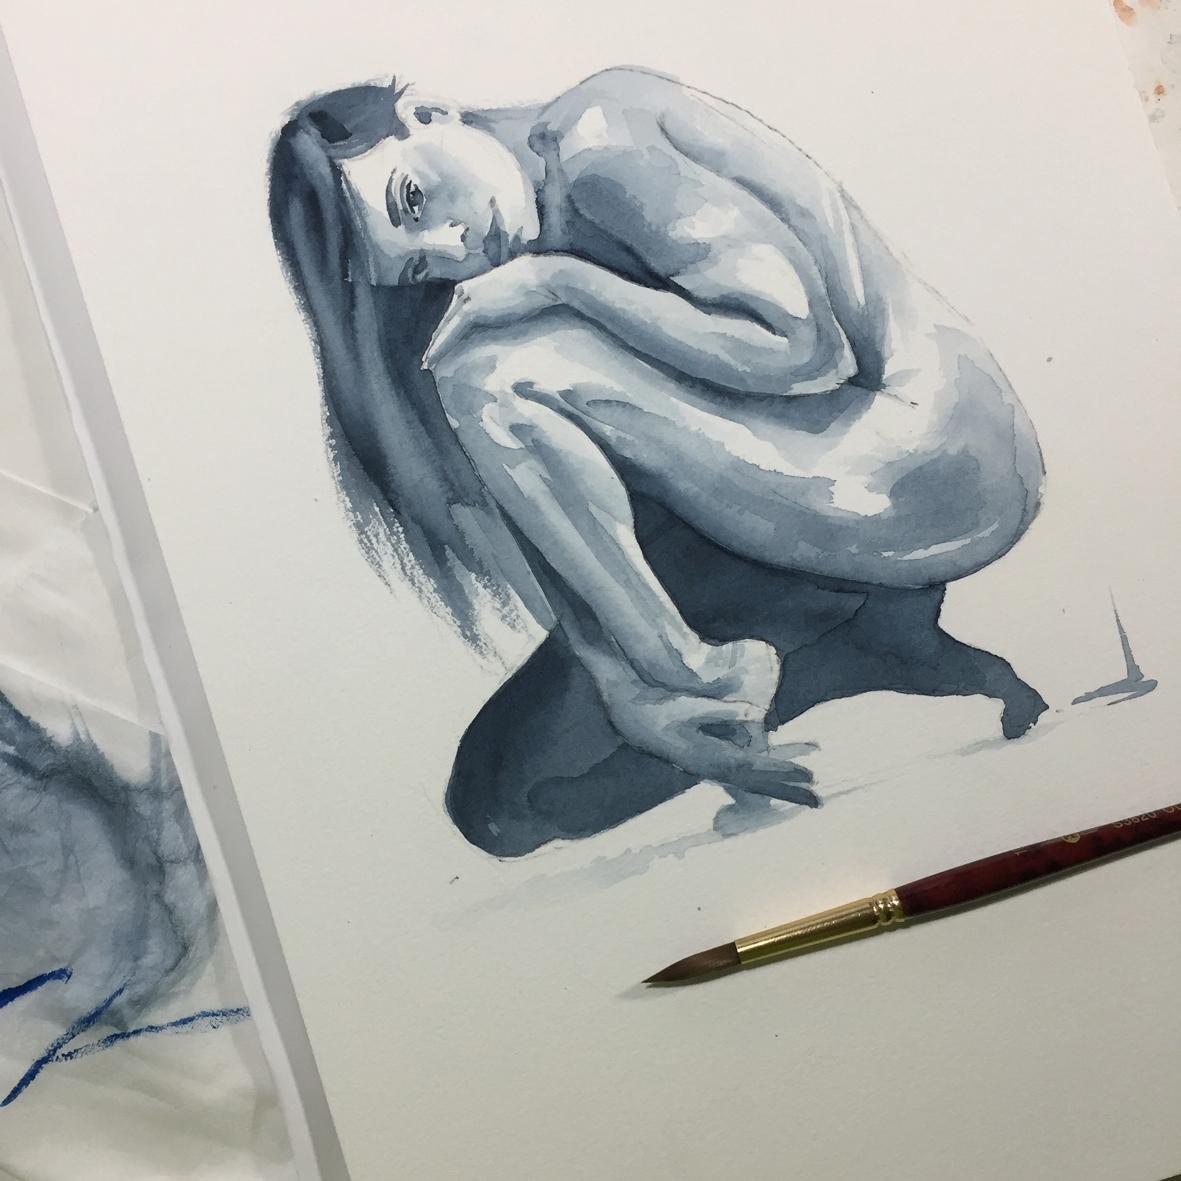 001 Alisa Vito Lentini Designer Acquarelli Sketches